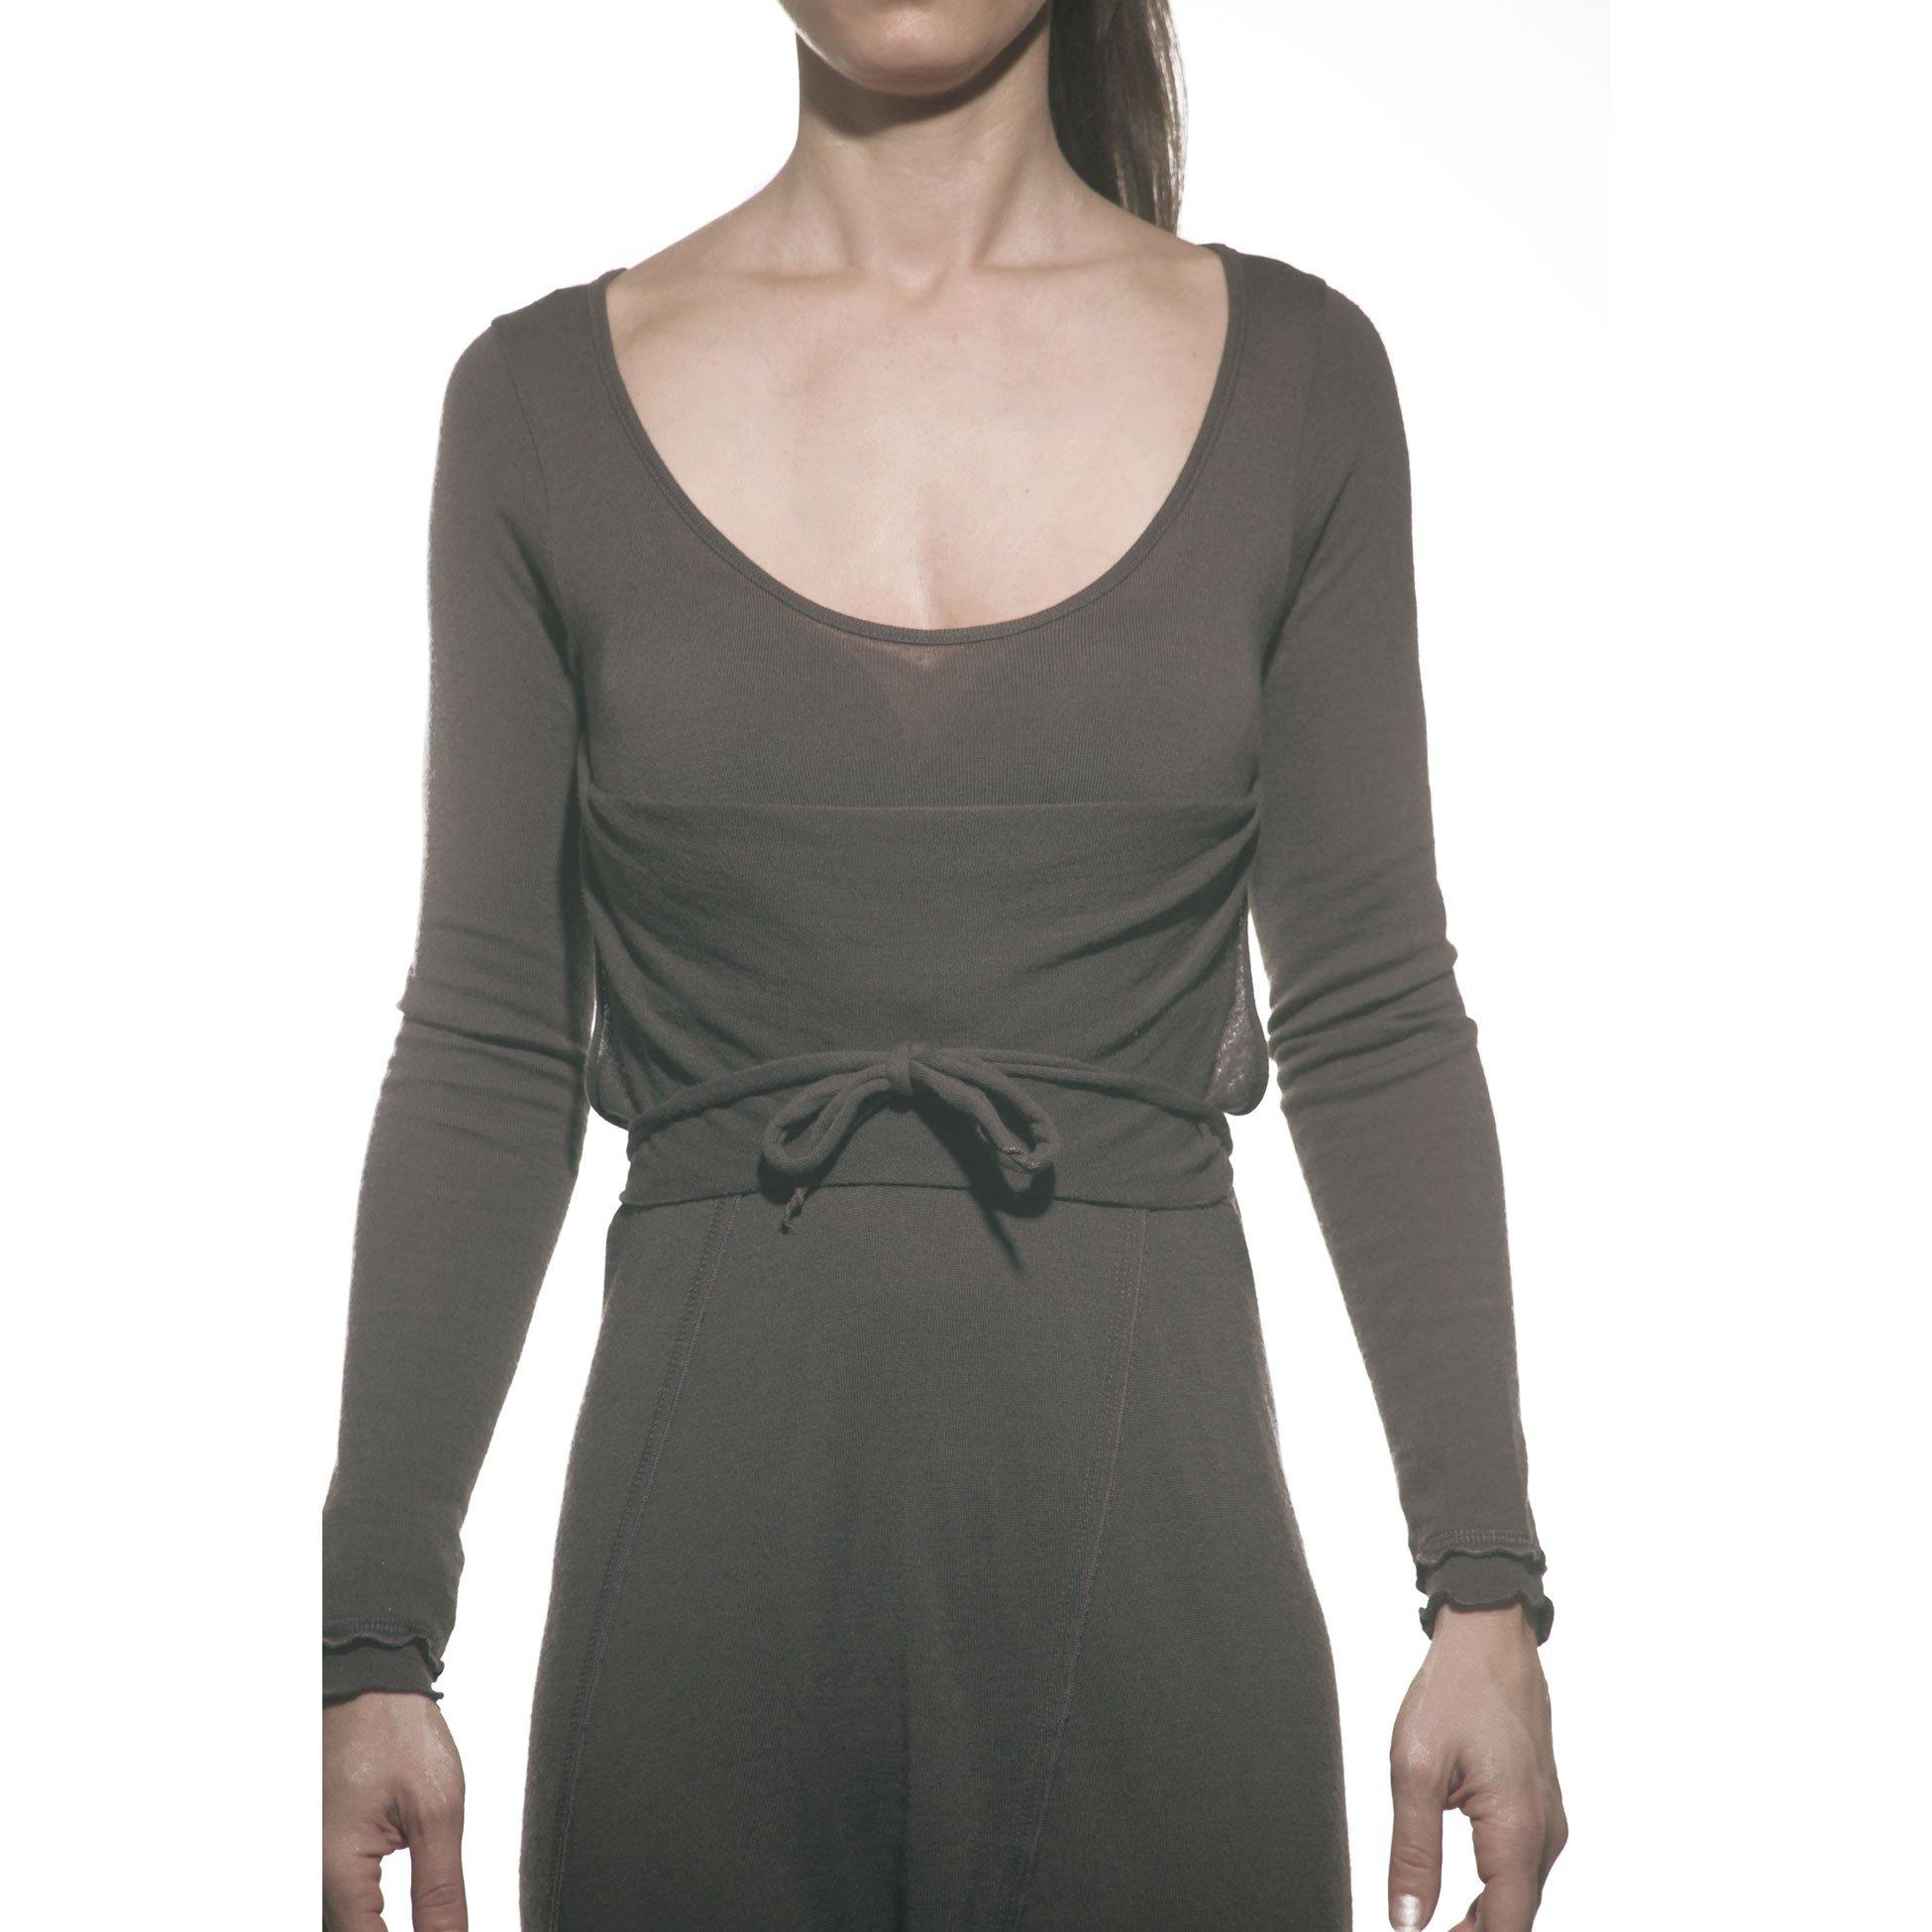 Cristina Gavioli collection